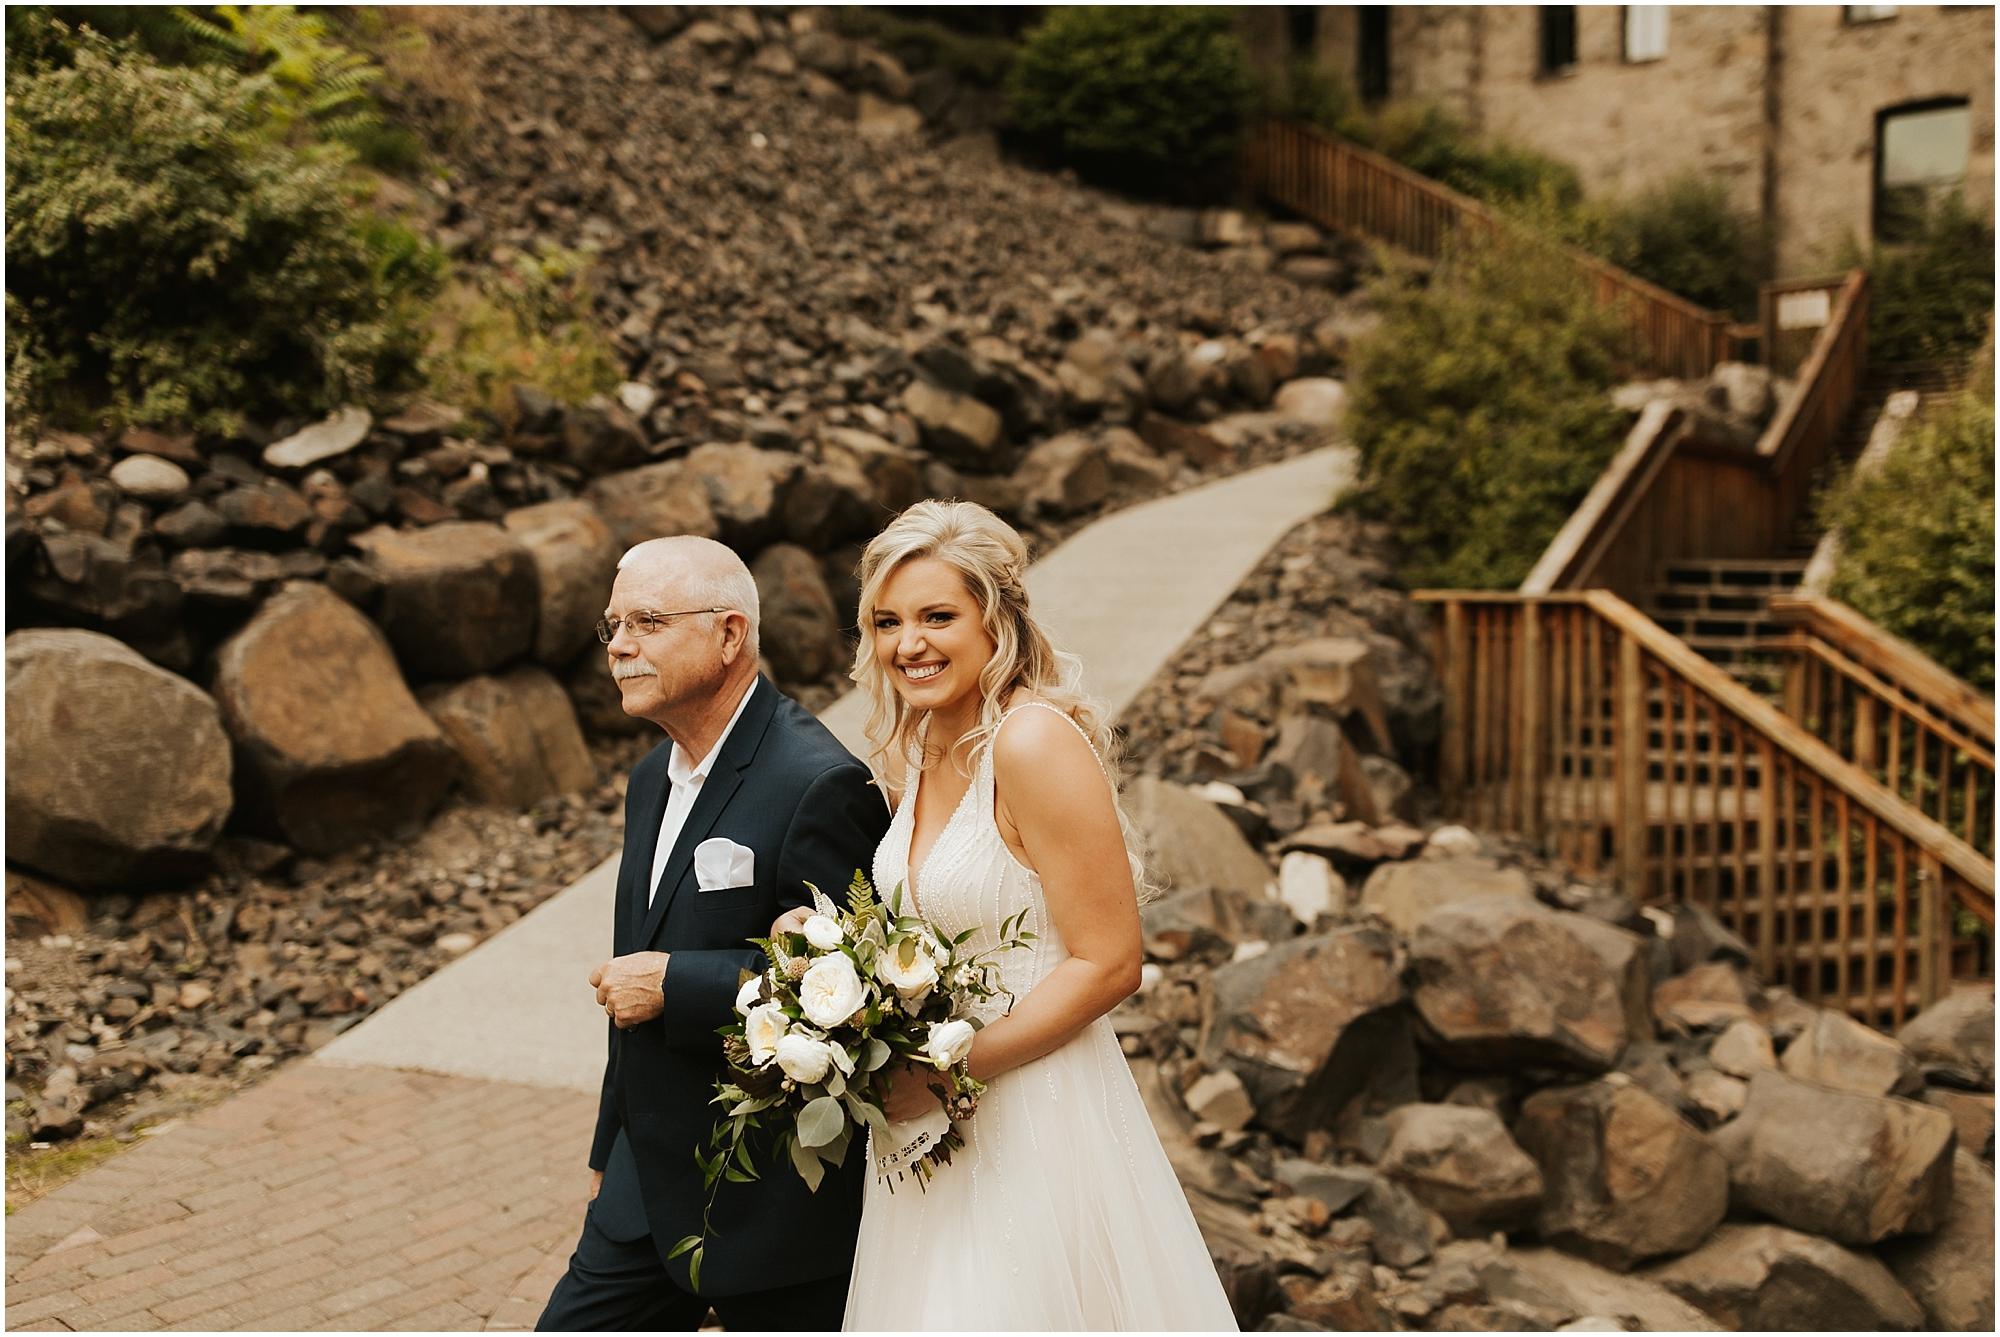 Chateau Rive Spokane Wedding Cassie Trottier Photography1067.jpg